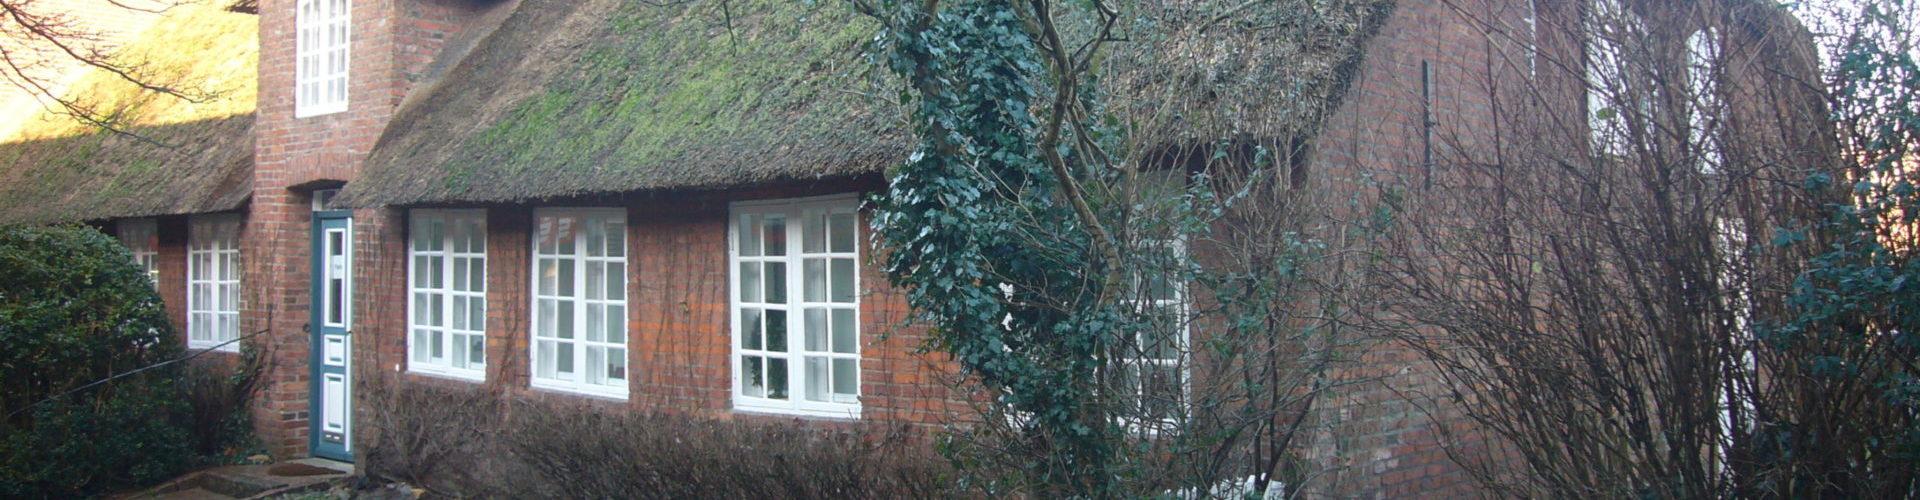 Niebüll Haus